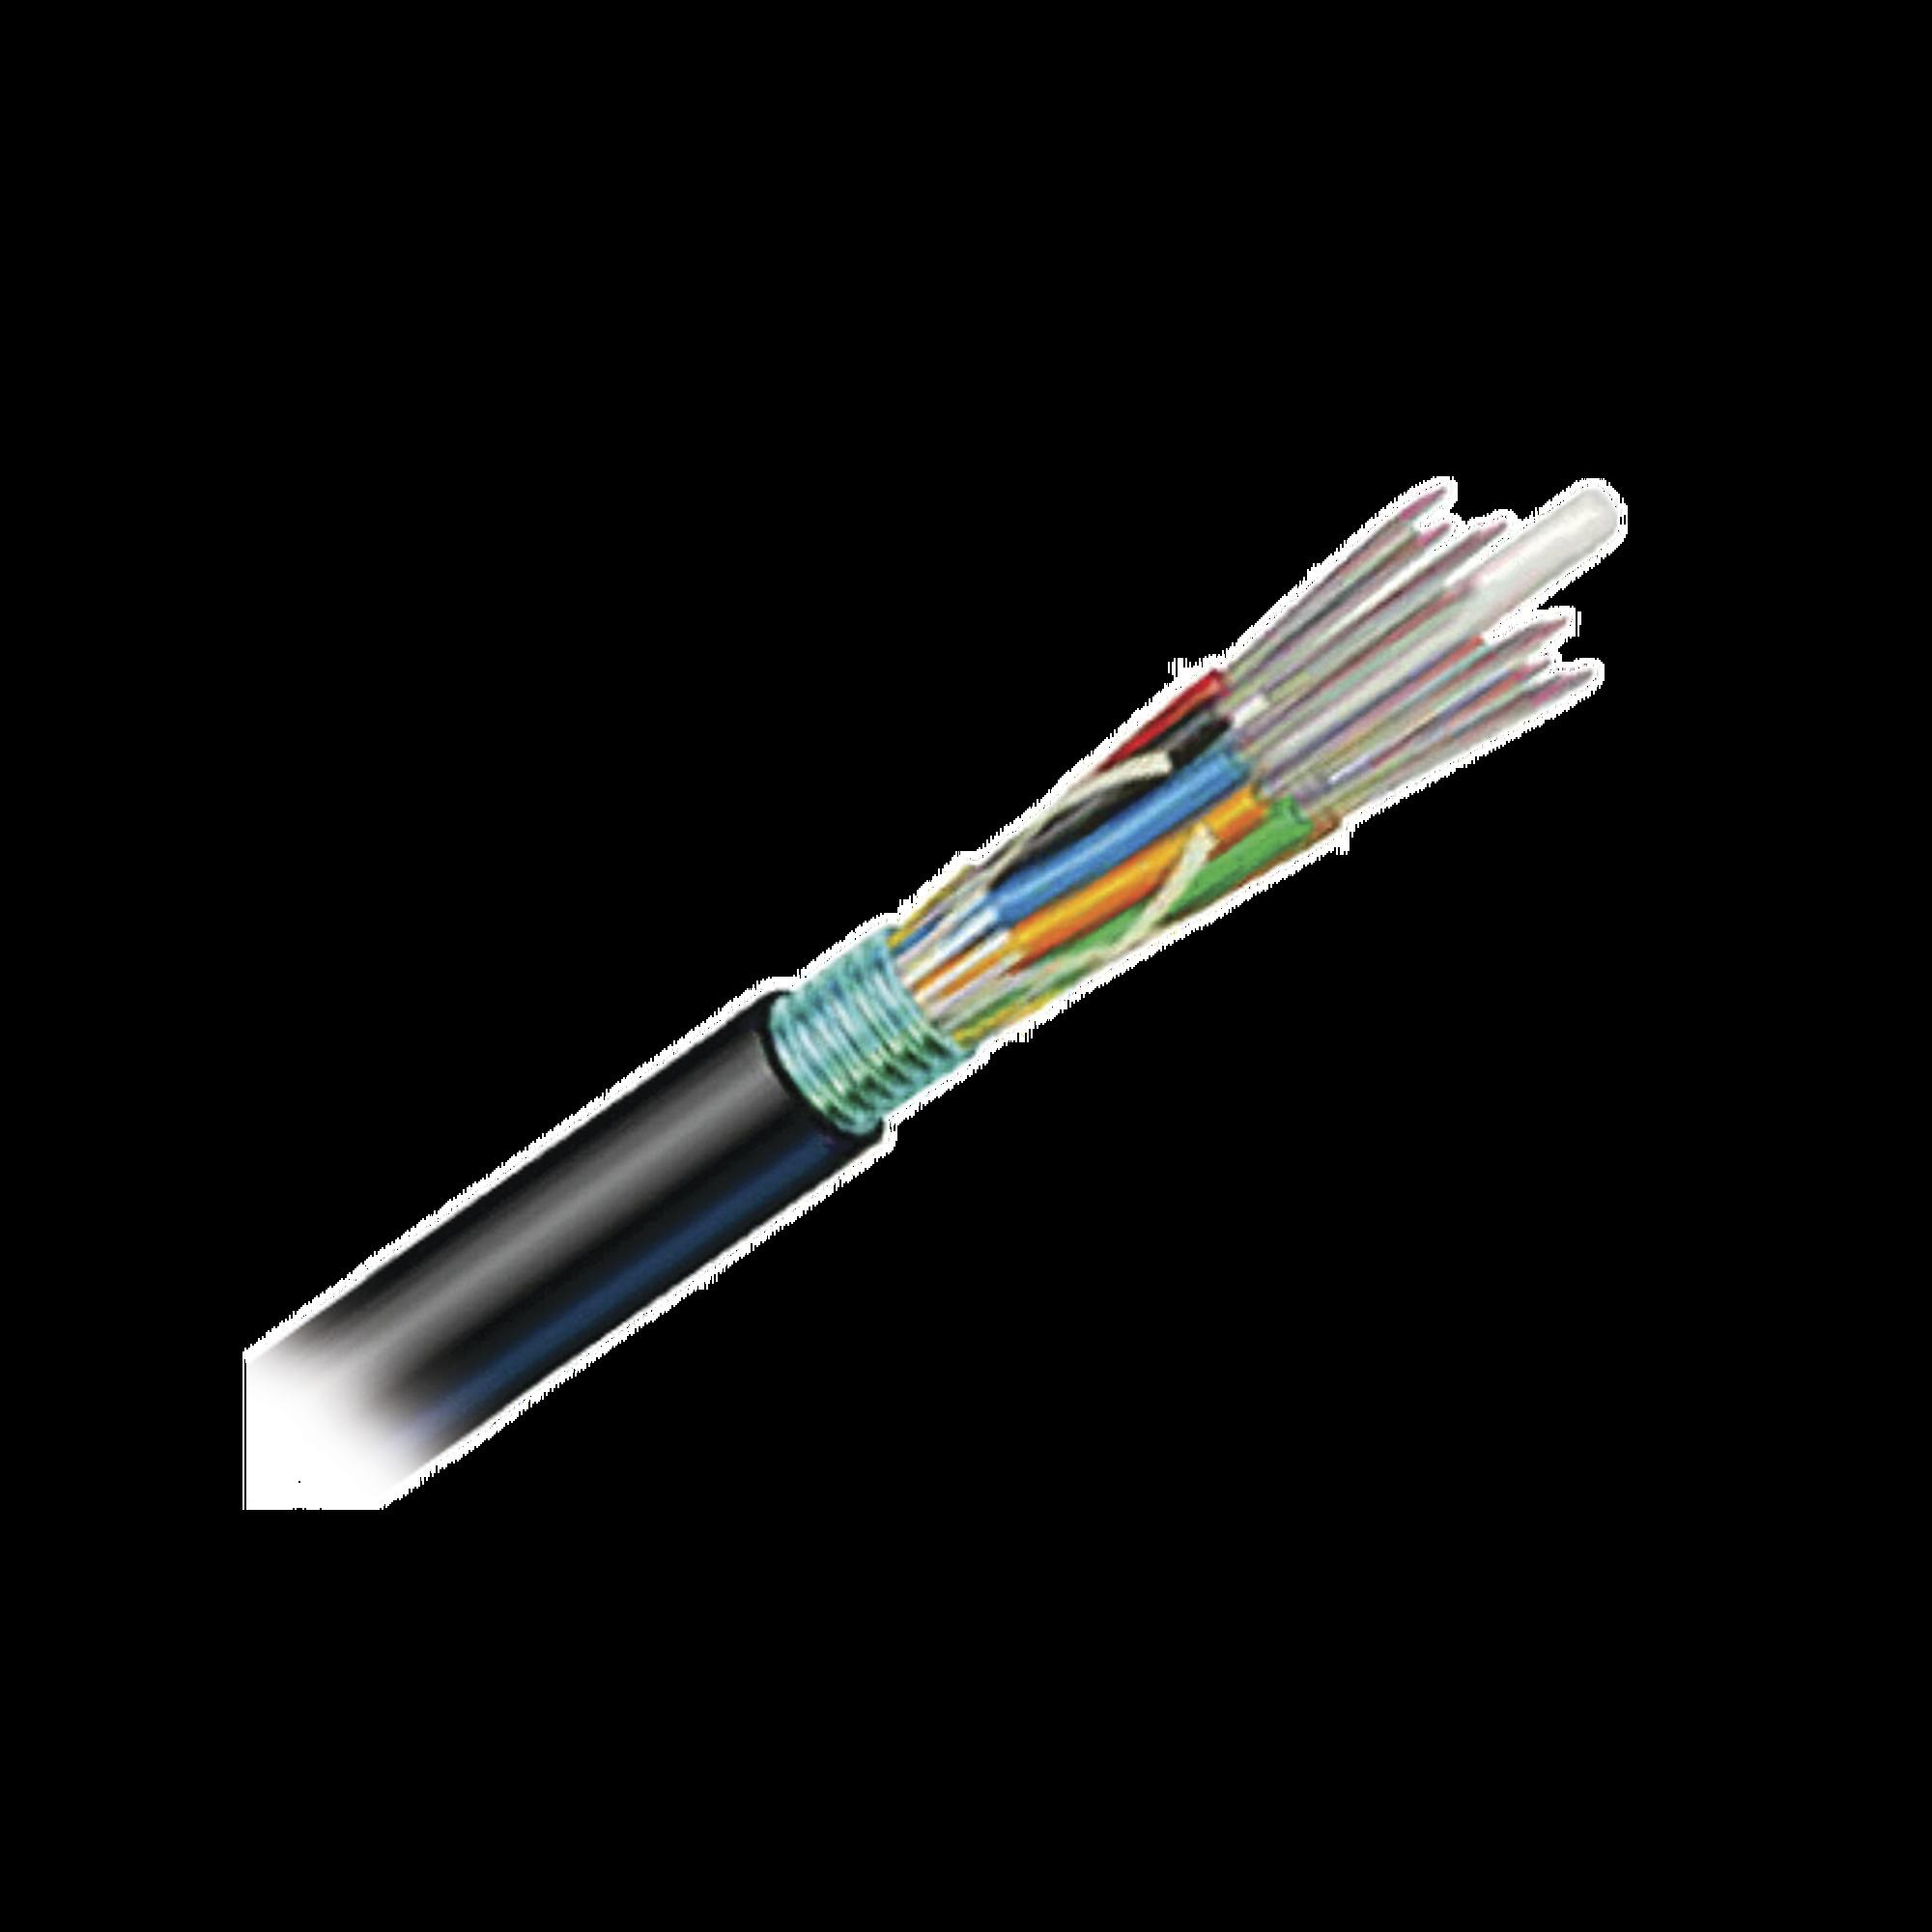 Cable de Fibra Óptica de 12 hilos, OSP (Planta Externa), Armada, Gel, HDPE (Polietileno de alta densidad), Monomodo OS2, 1 Metro